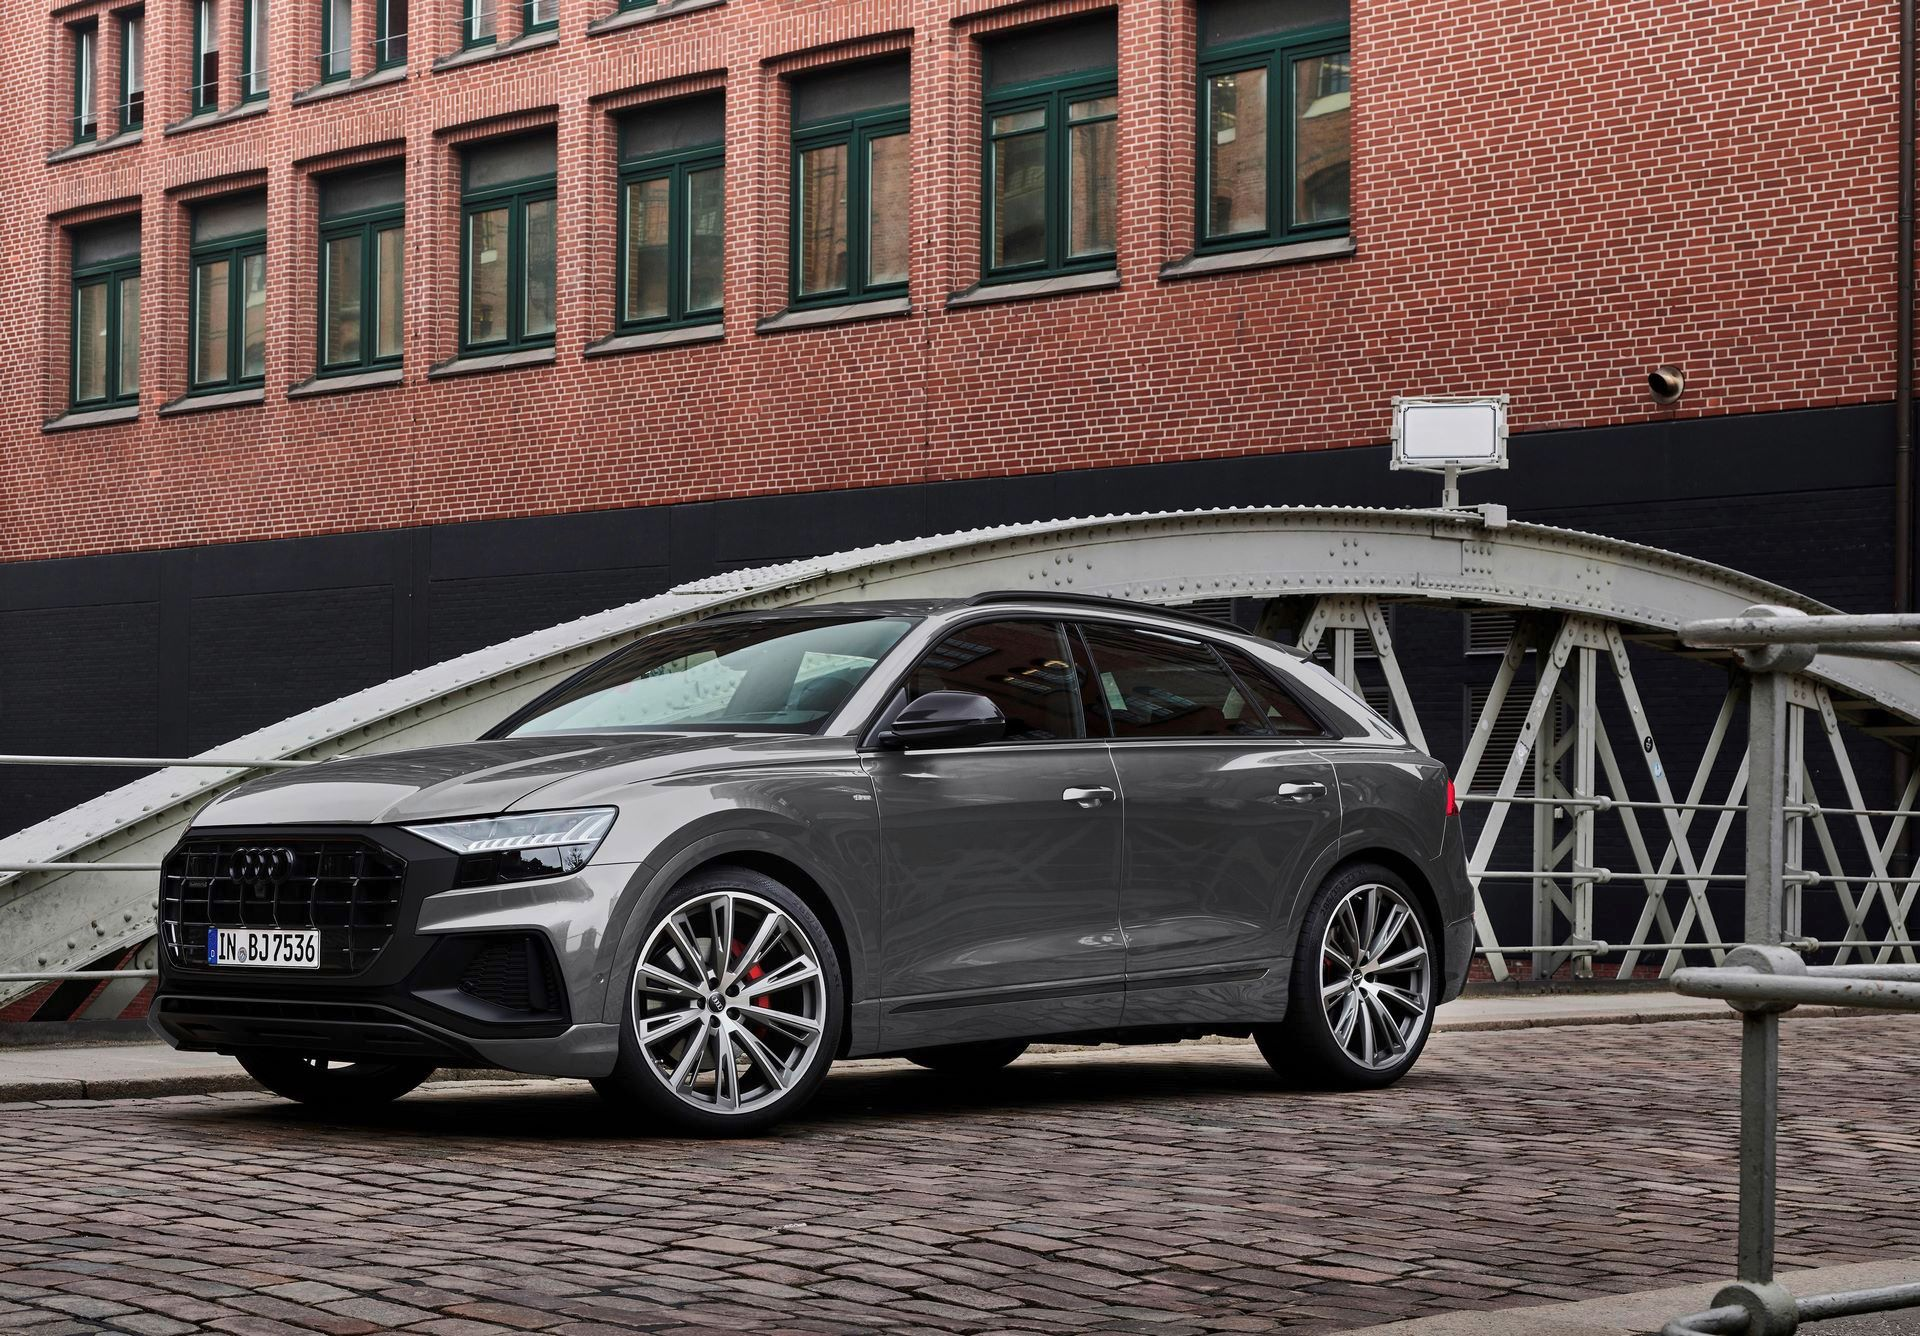 Audi-A4-A5-Q7-Q8-Competition-And-Competition-Plus-Trims-9